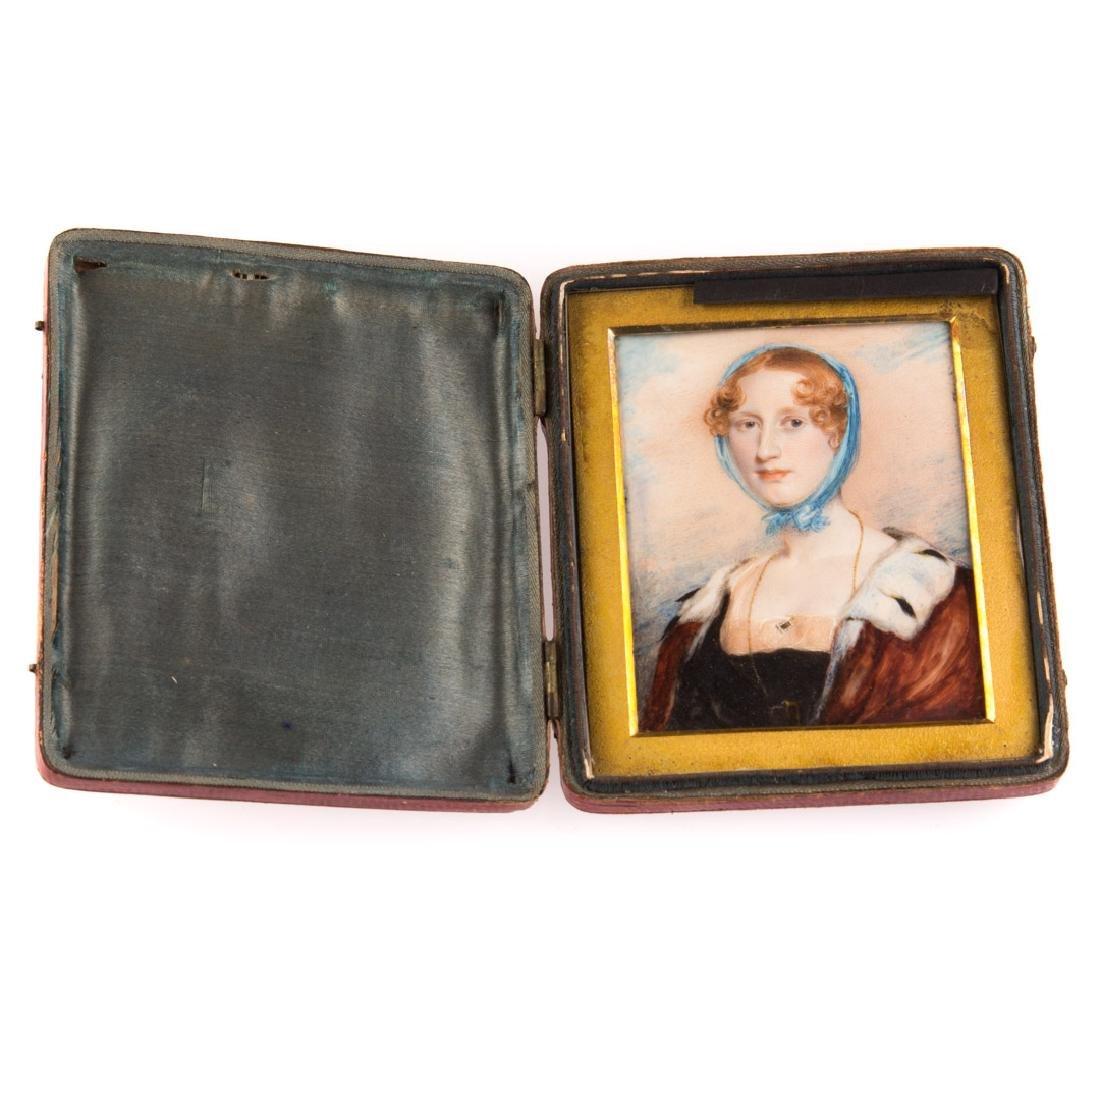 English School, 19th century miniature portrait